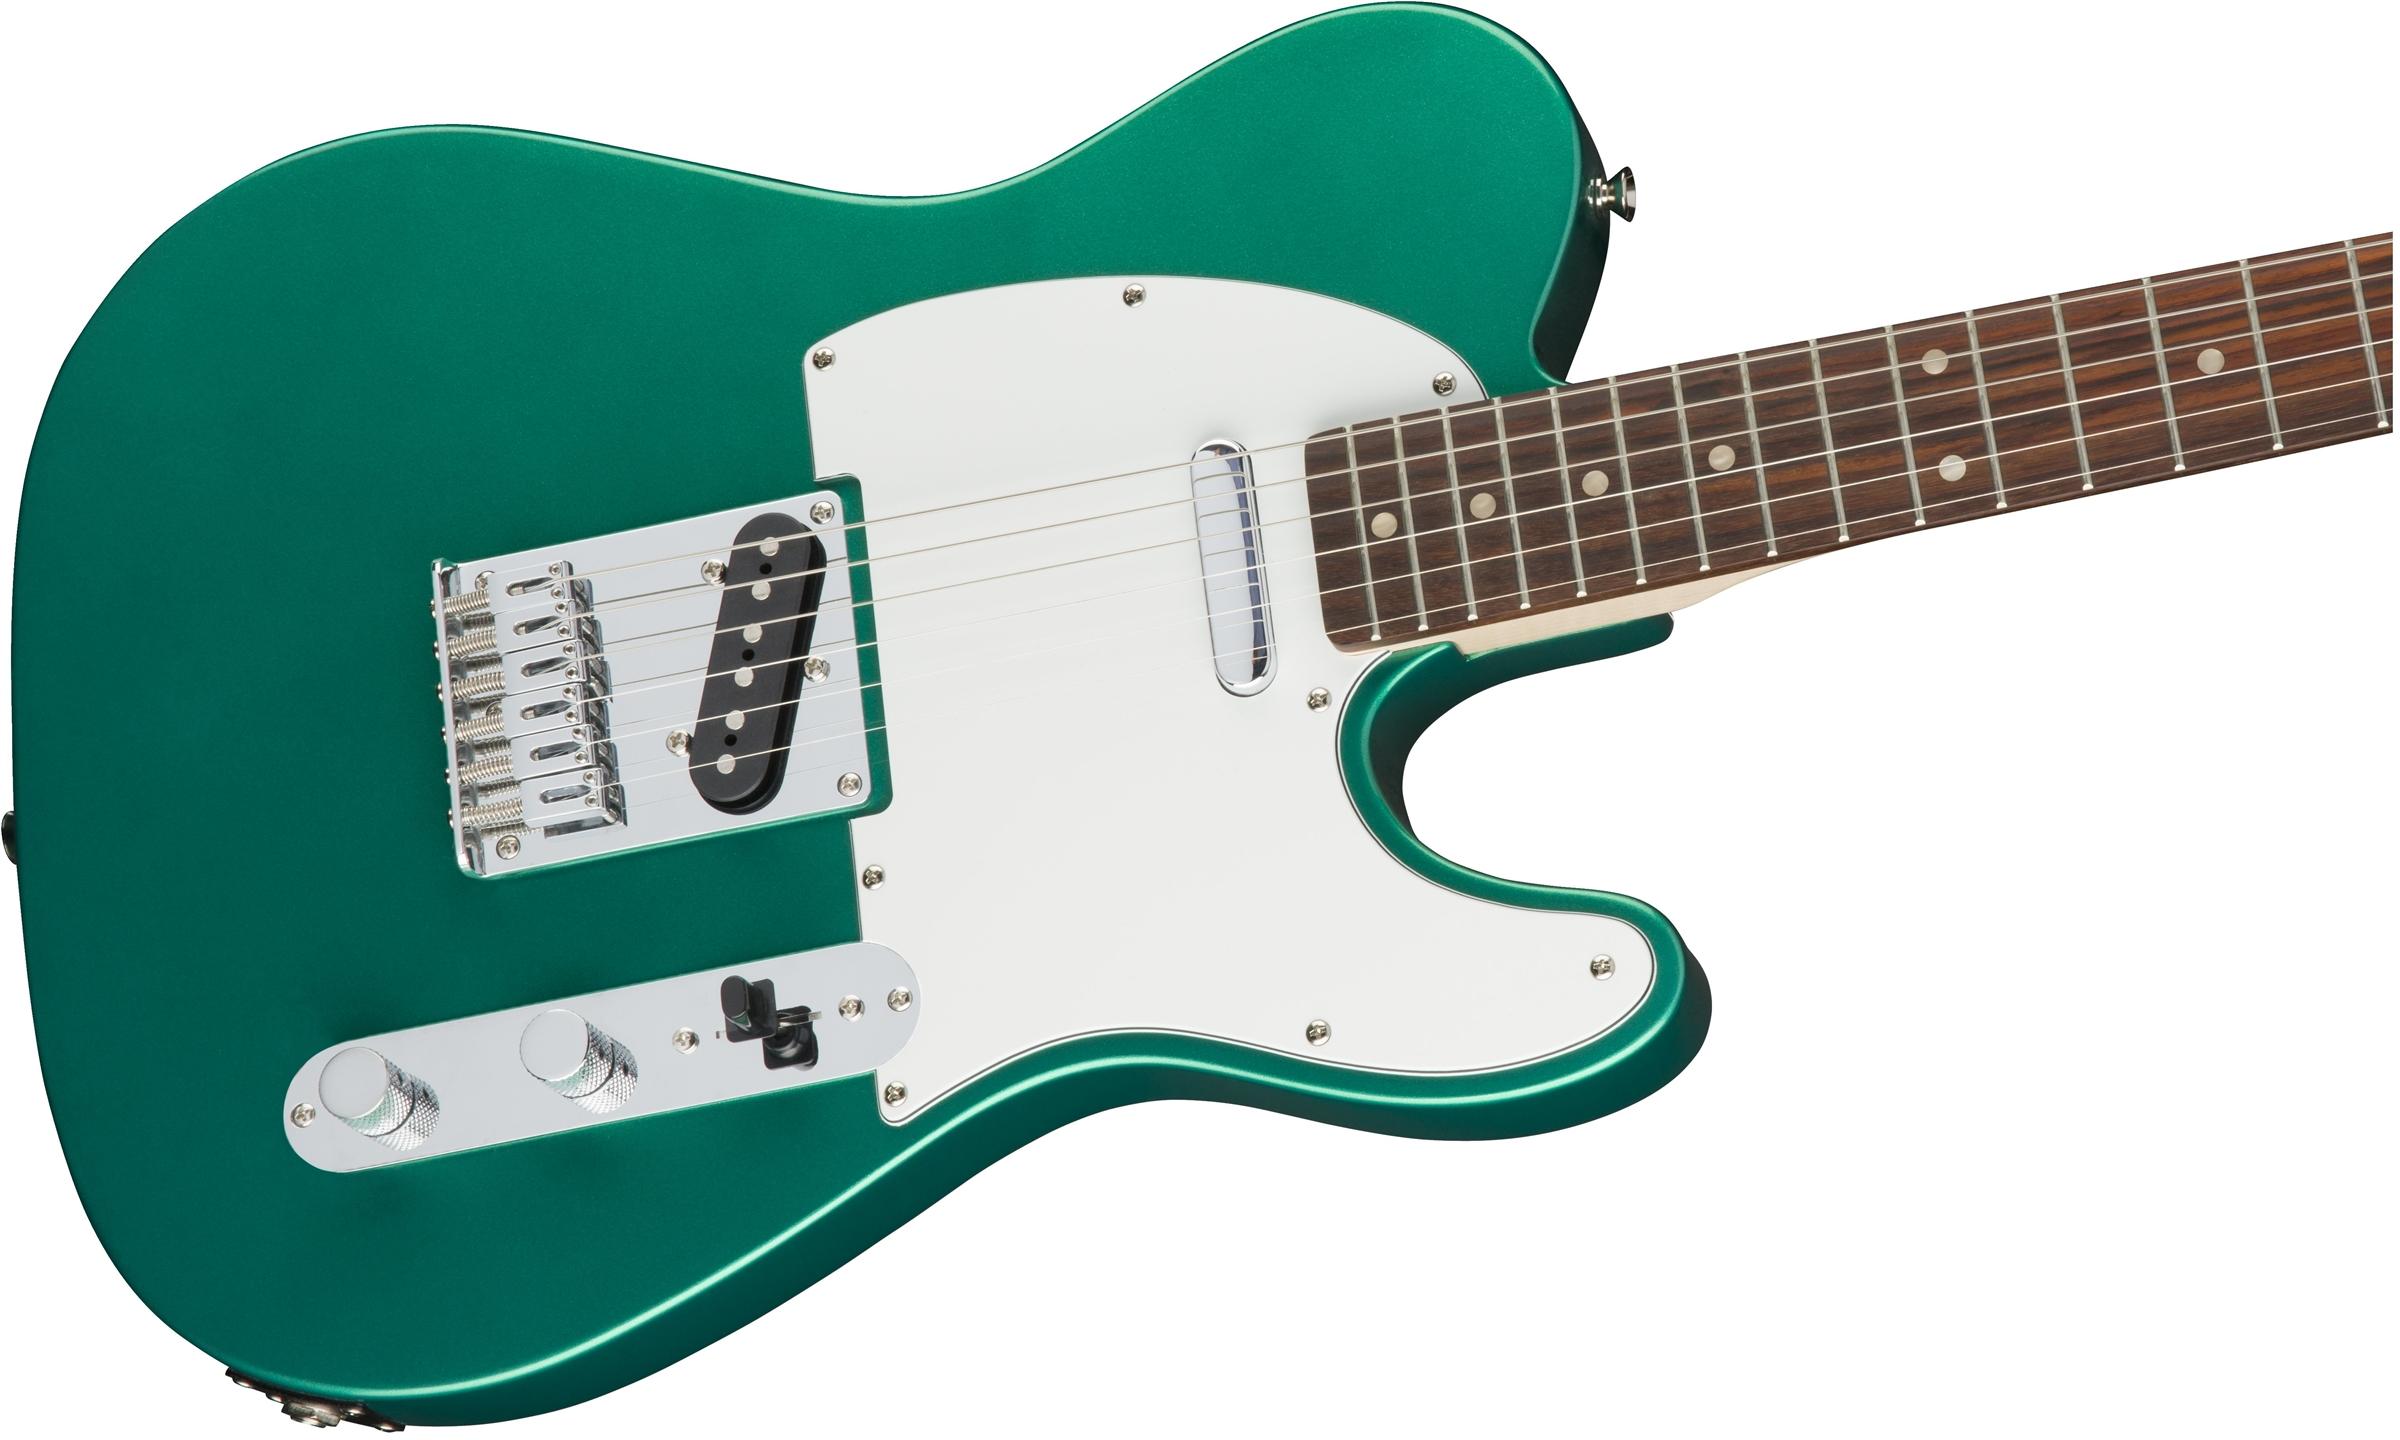 affinity series telecaster squier electric guitars. Black Bedroom Furniture Sets. Home Design Ideas